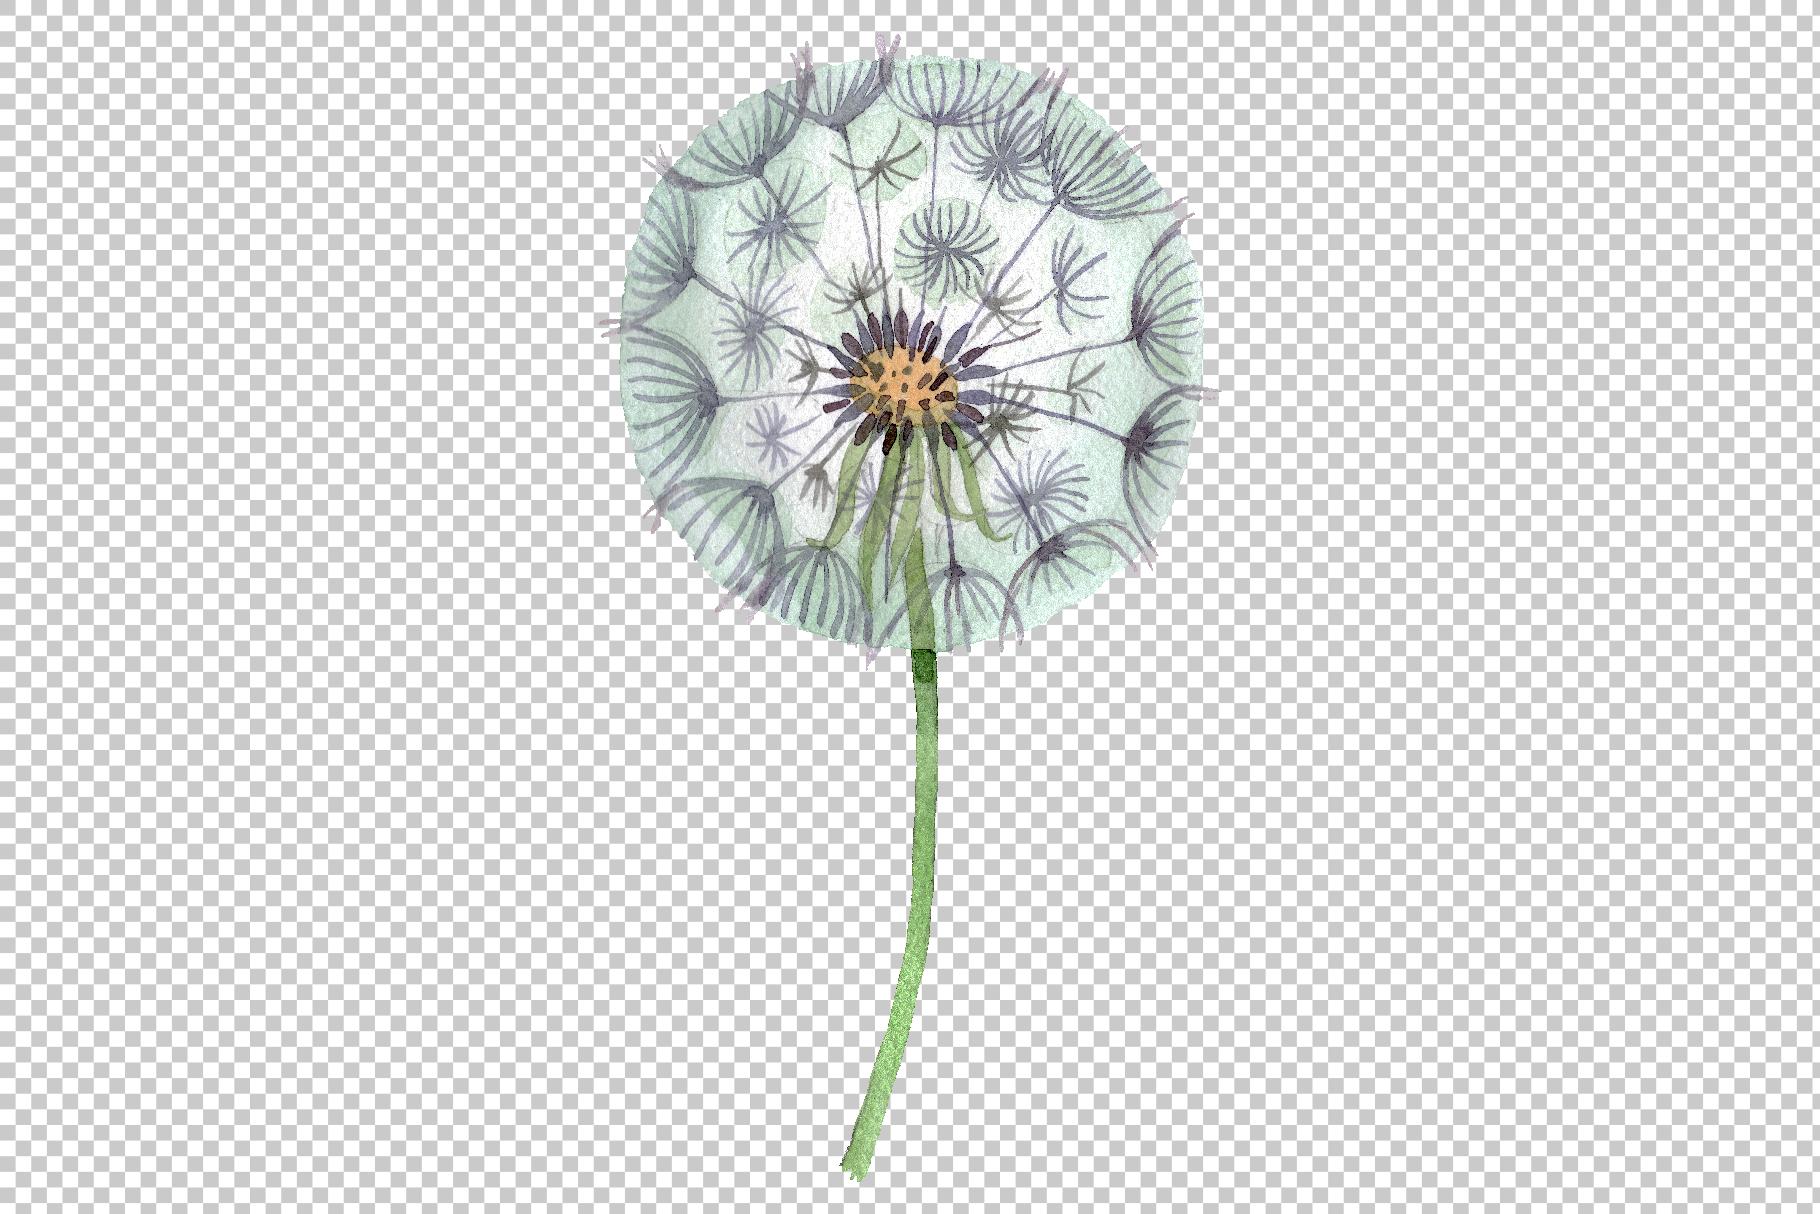 Dandelion summer greeting watercolor png example image 2